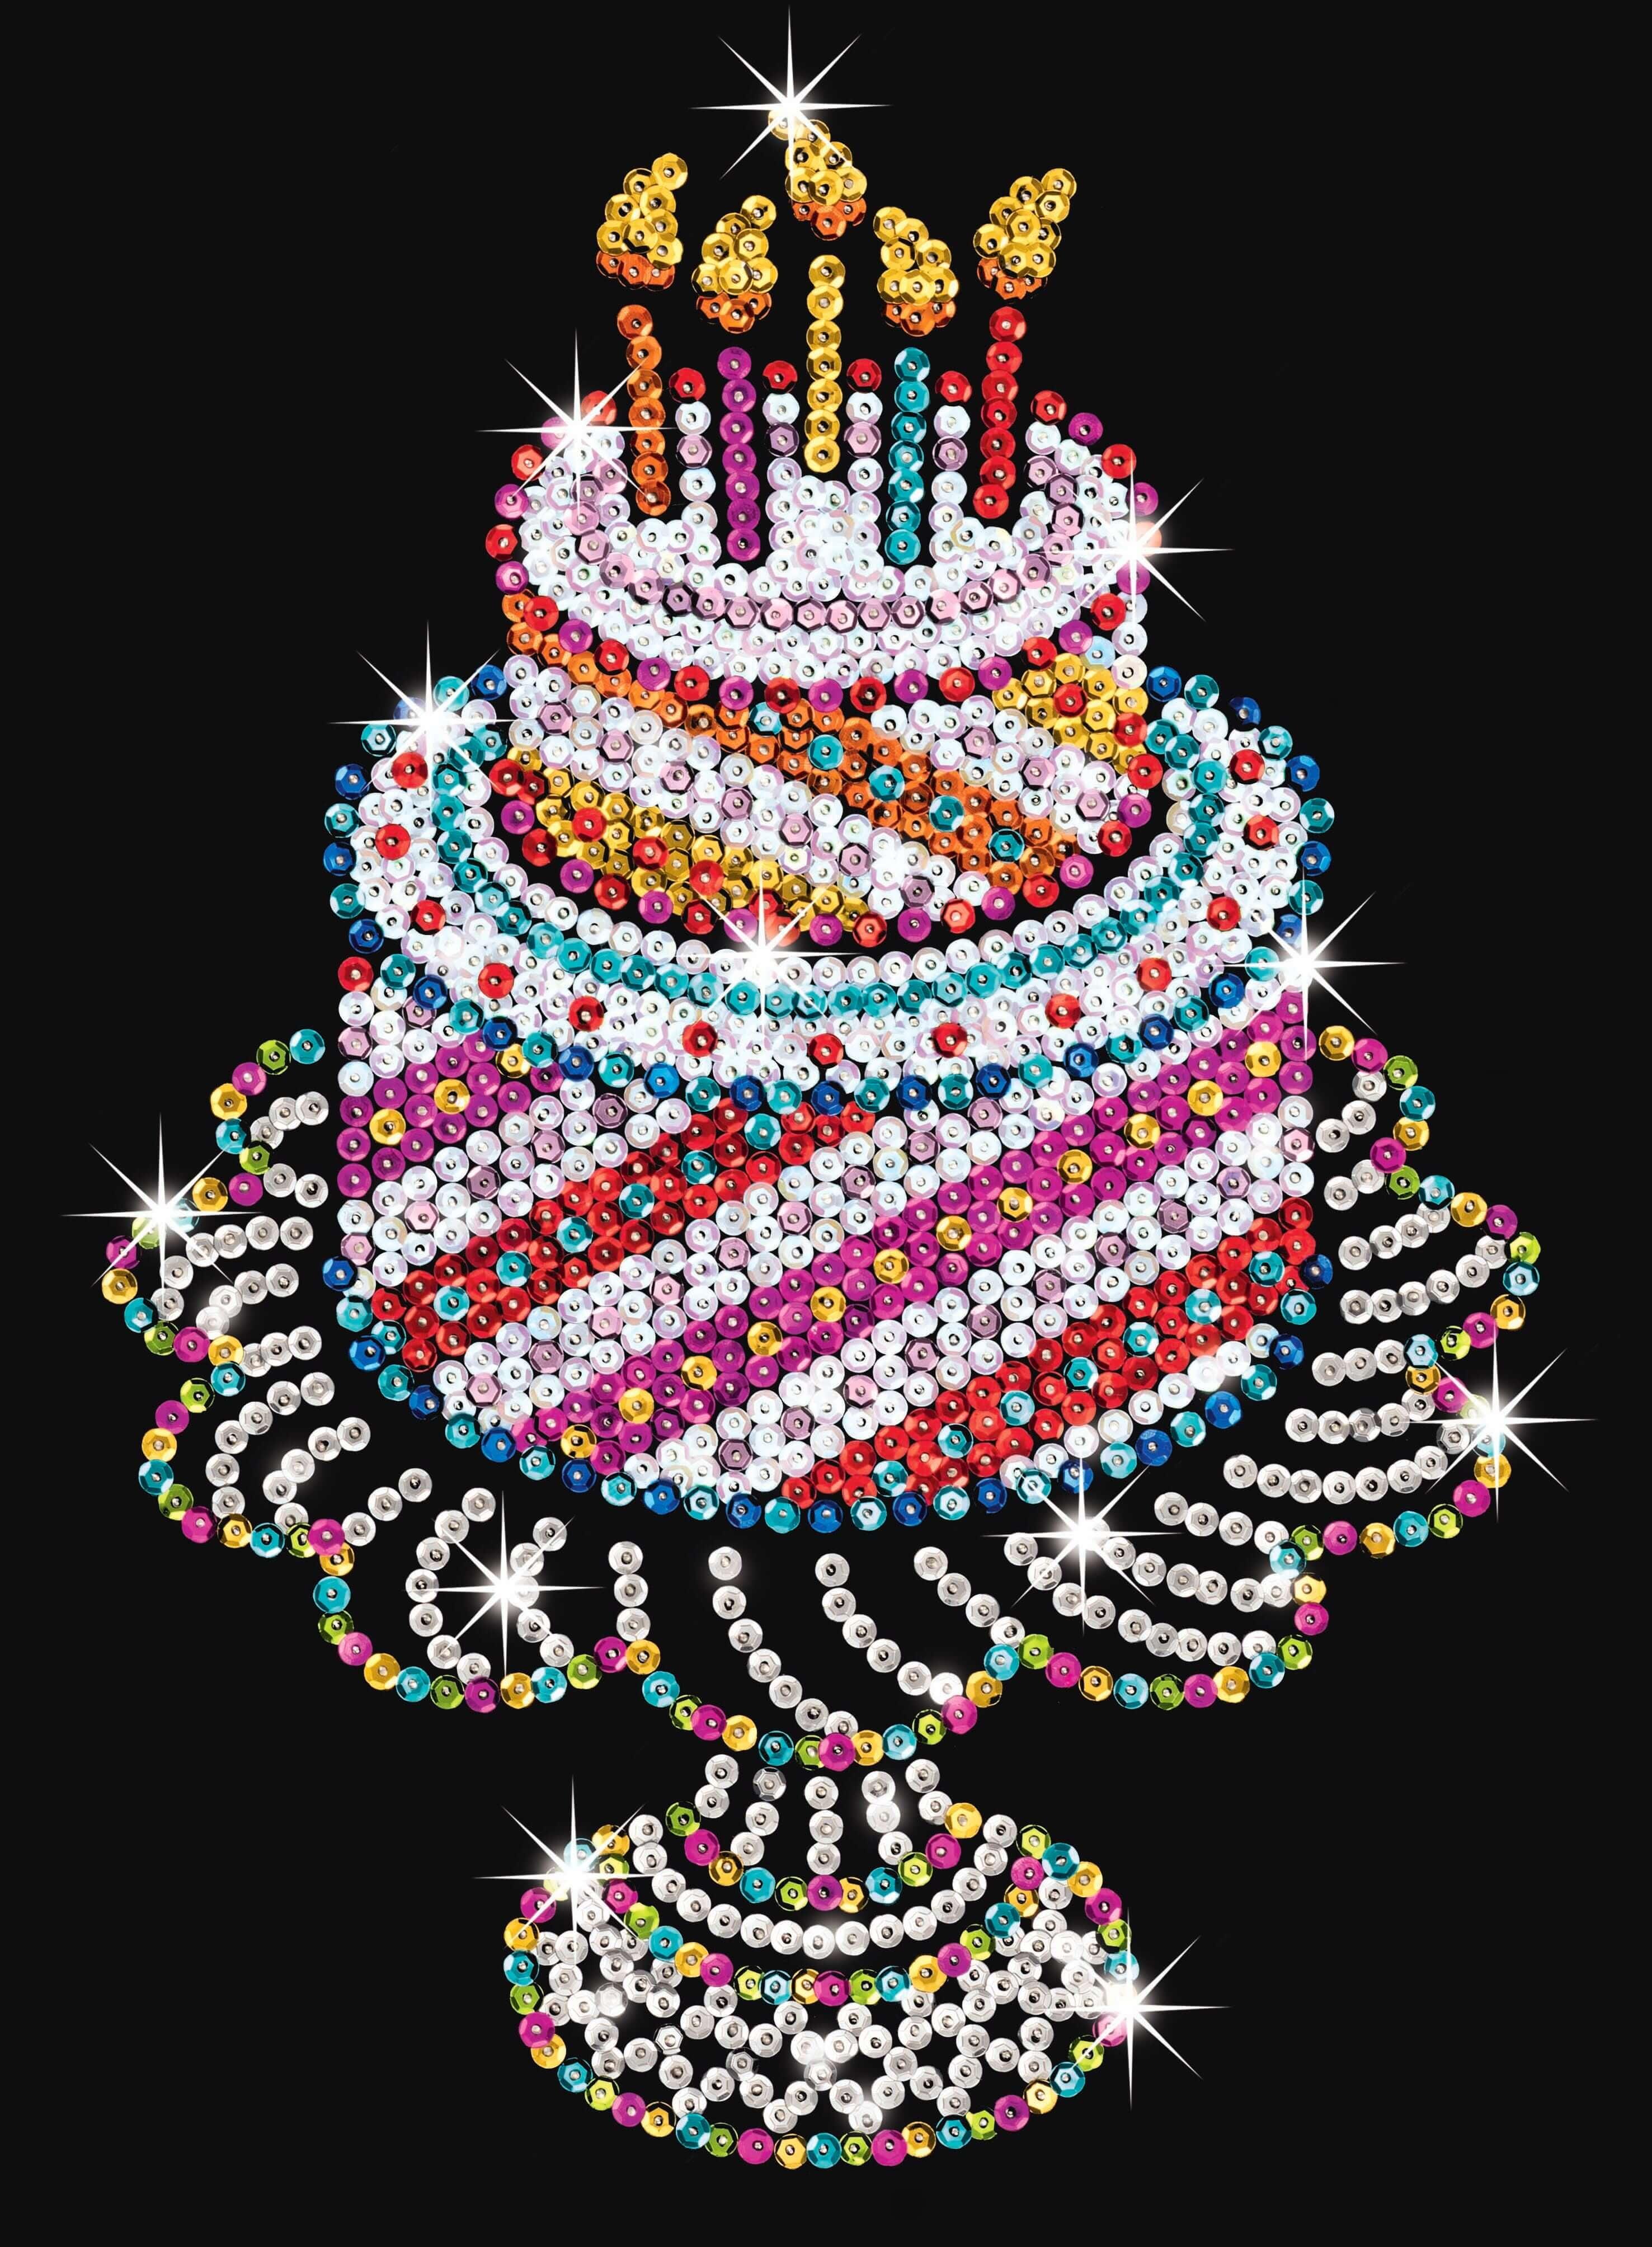 KSG Sequin Art Birthday Cake | Hobbies